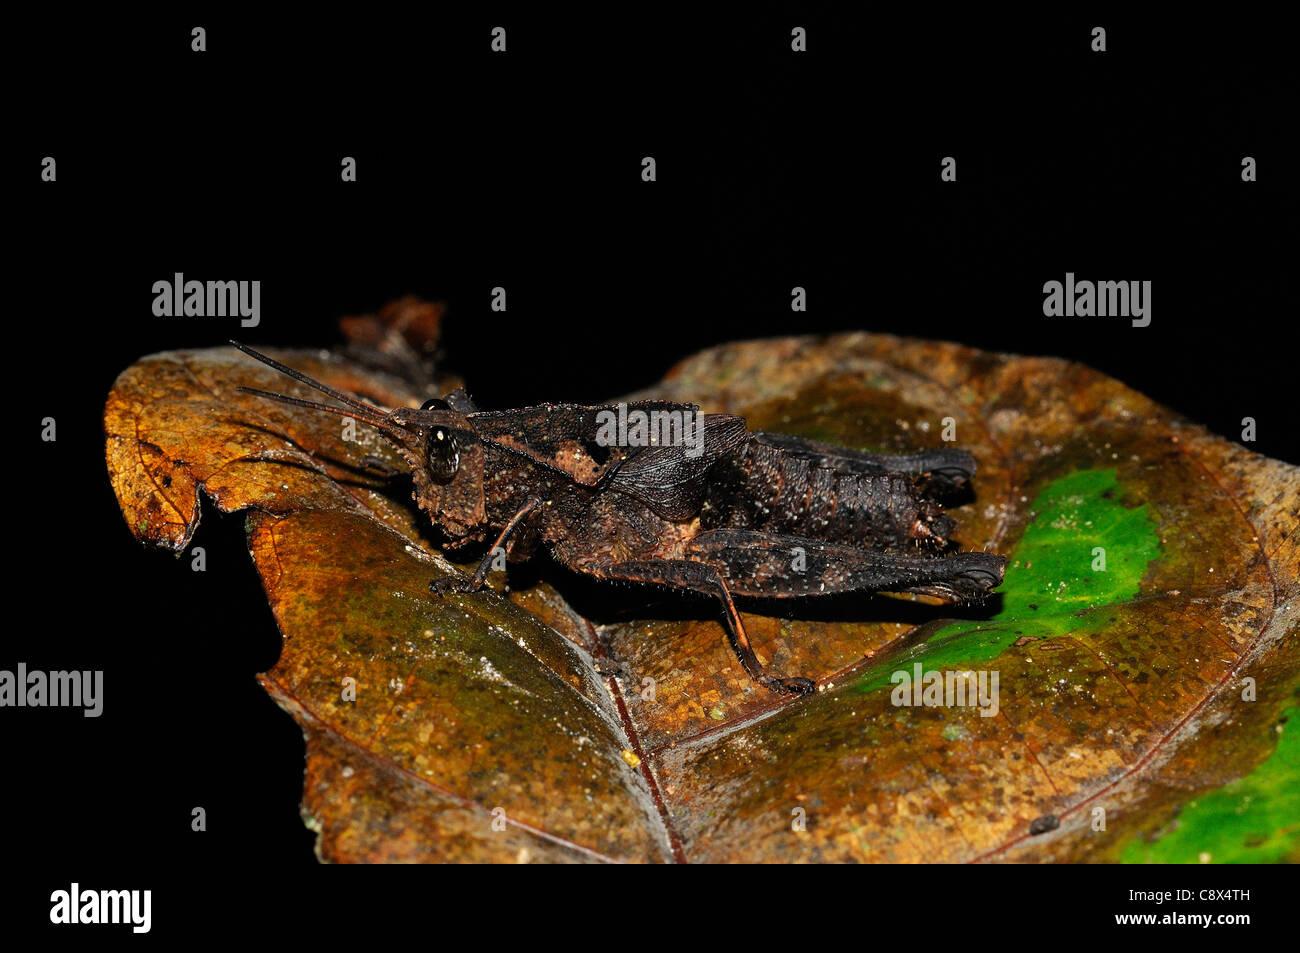 Acridid Short-horned Grasshopper (Acrididae) flightless. amongst Stock Photo: 39912561 - Alamy